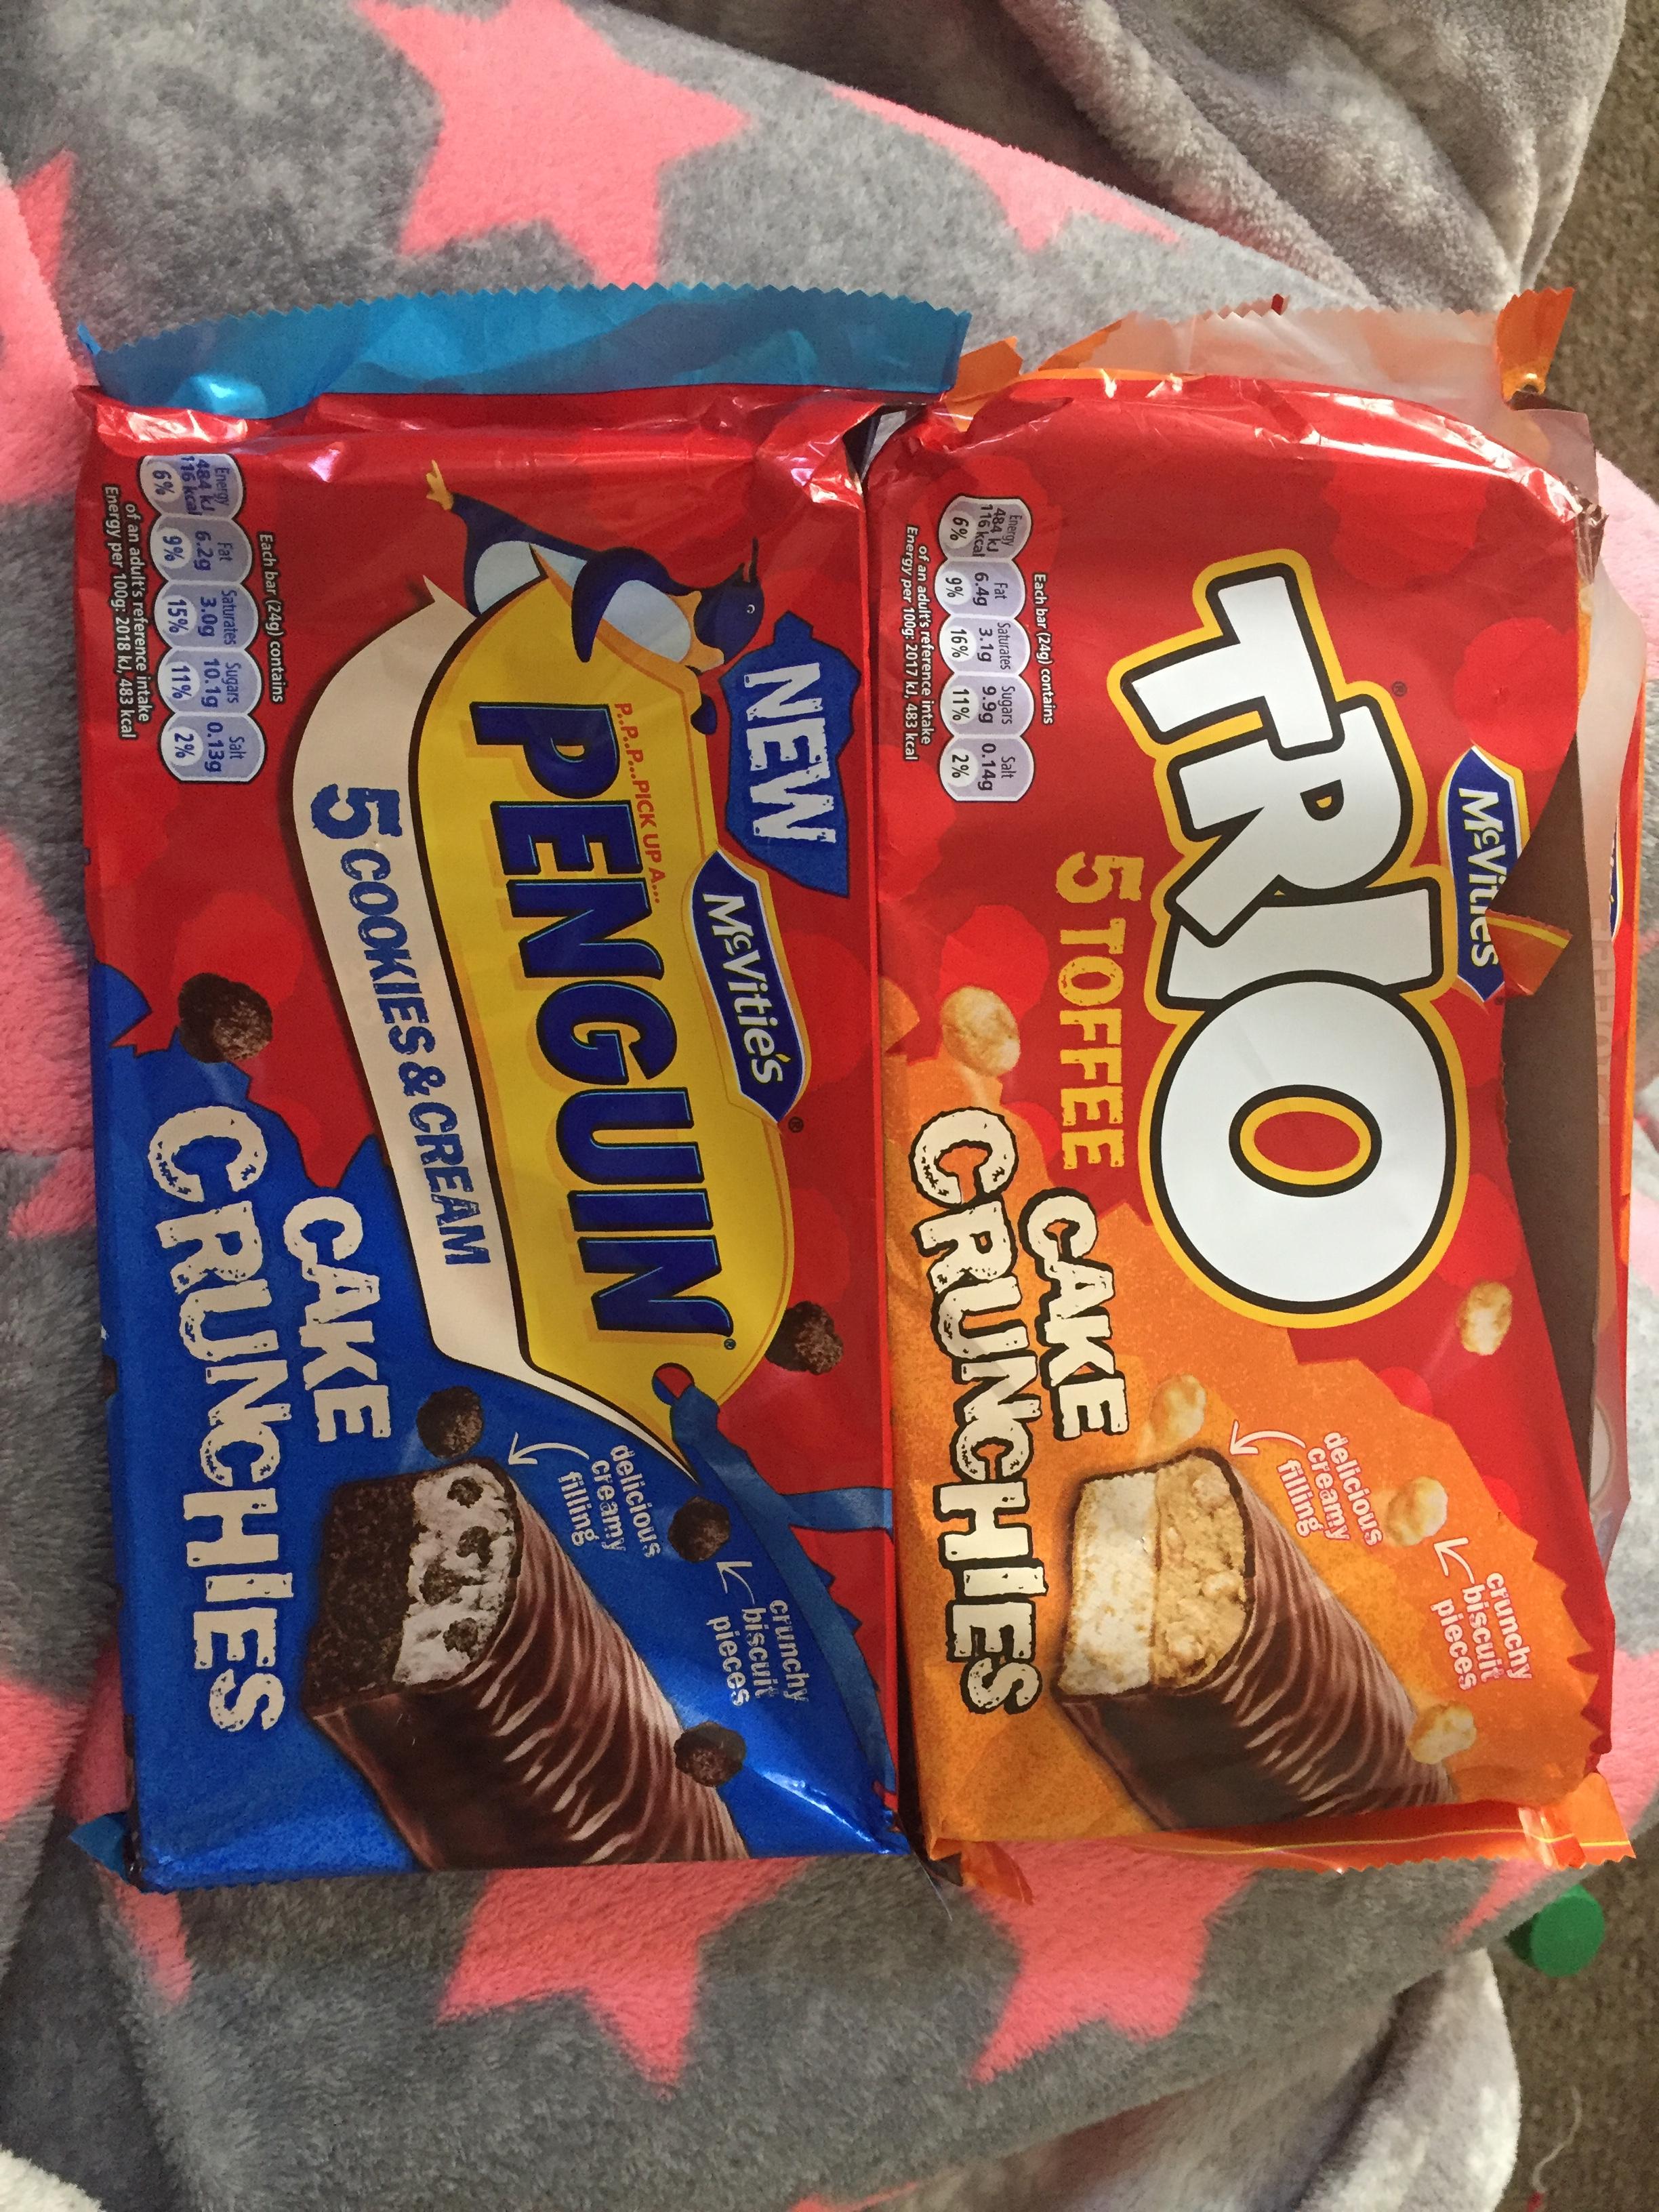 New mcvities cake crunch bars 5pack 59p or 2 pack for £1 Penguin & Trio @ Heron (10pks also 99p)